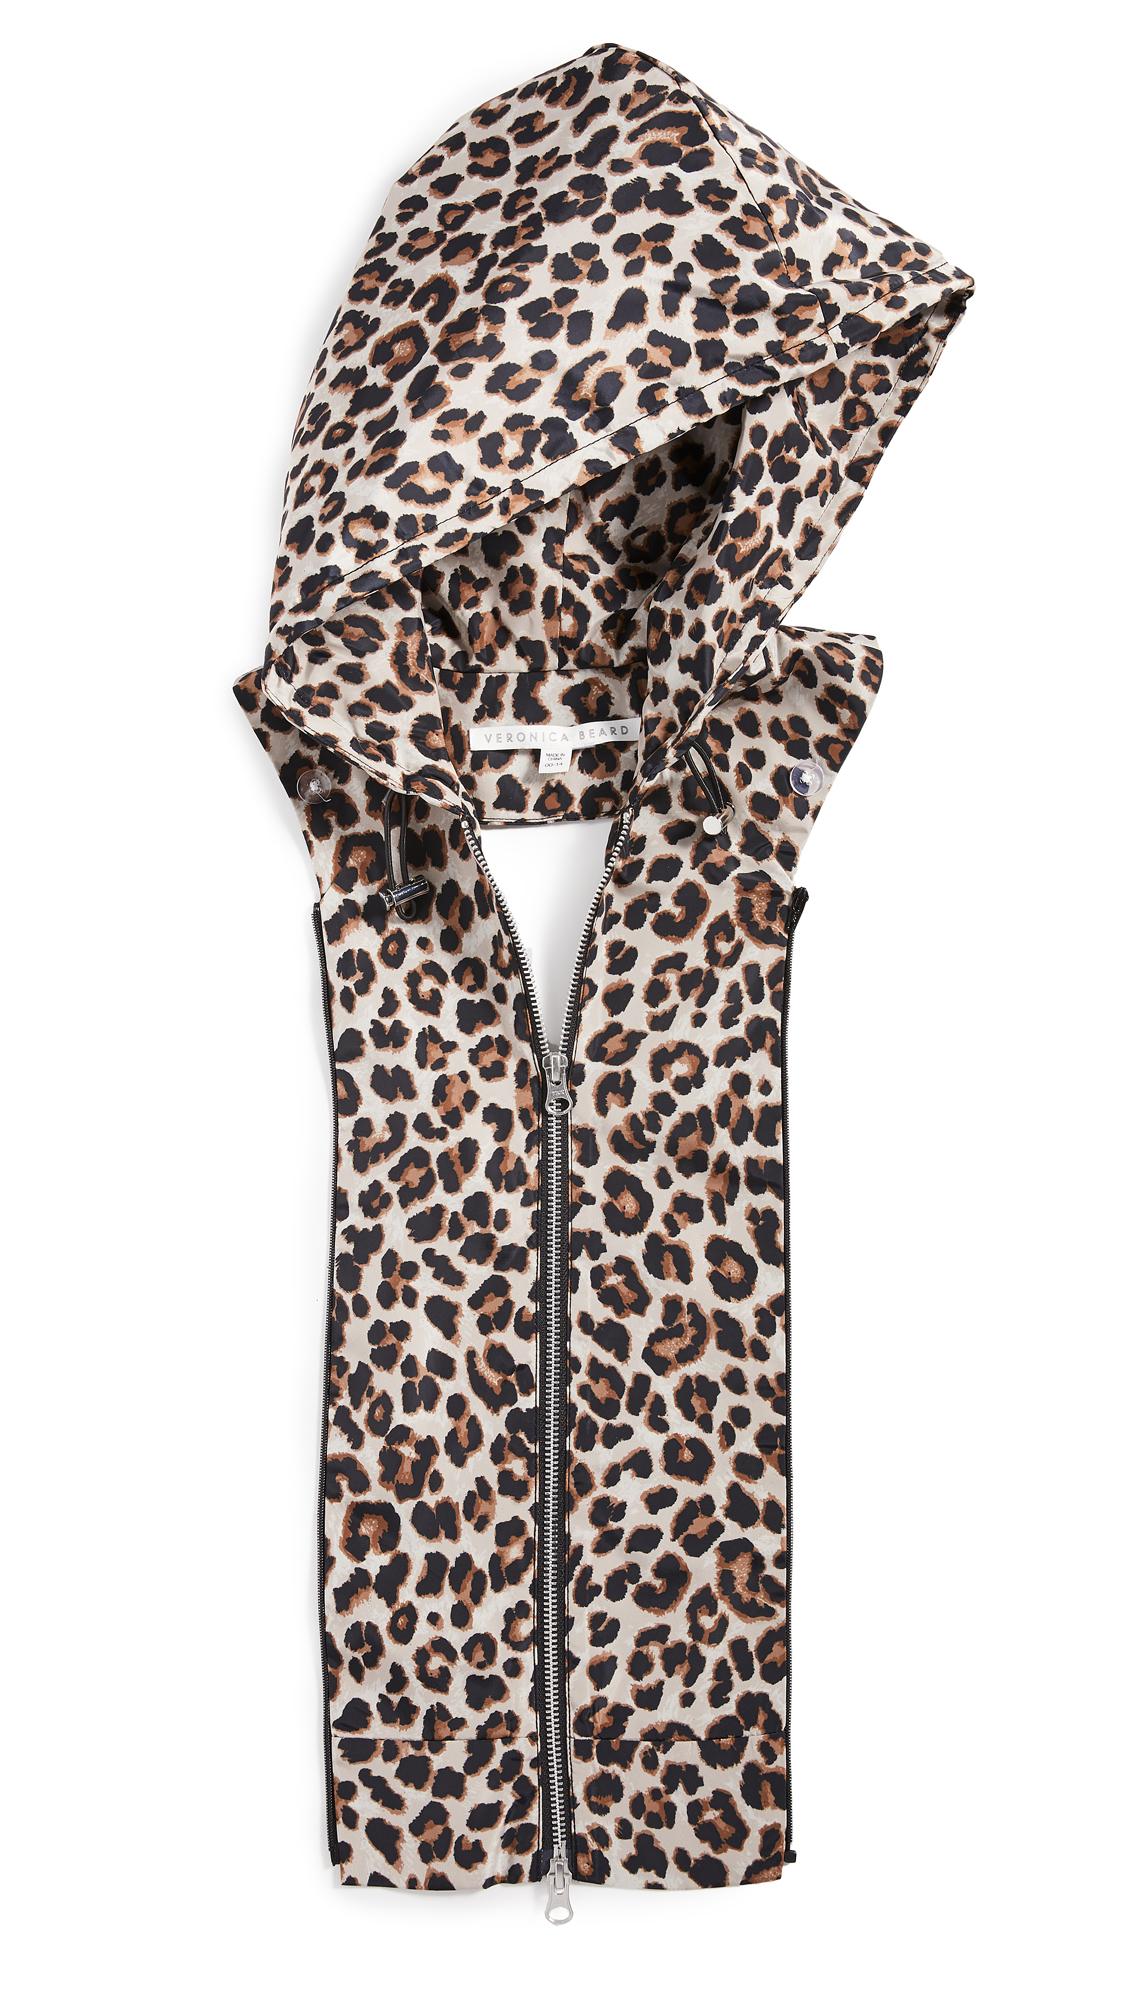 Buy Veronica Beard Hallie Leopard Dickey online beautiful Veronica Beard Jackets, Coats, Coats